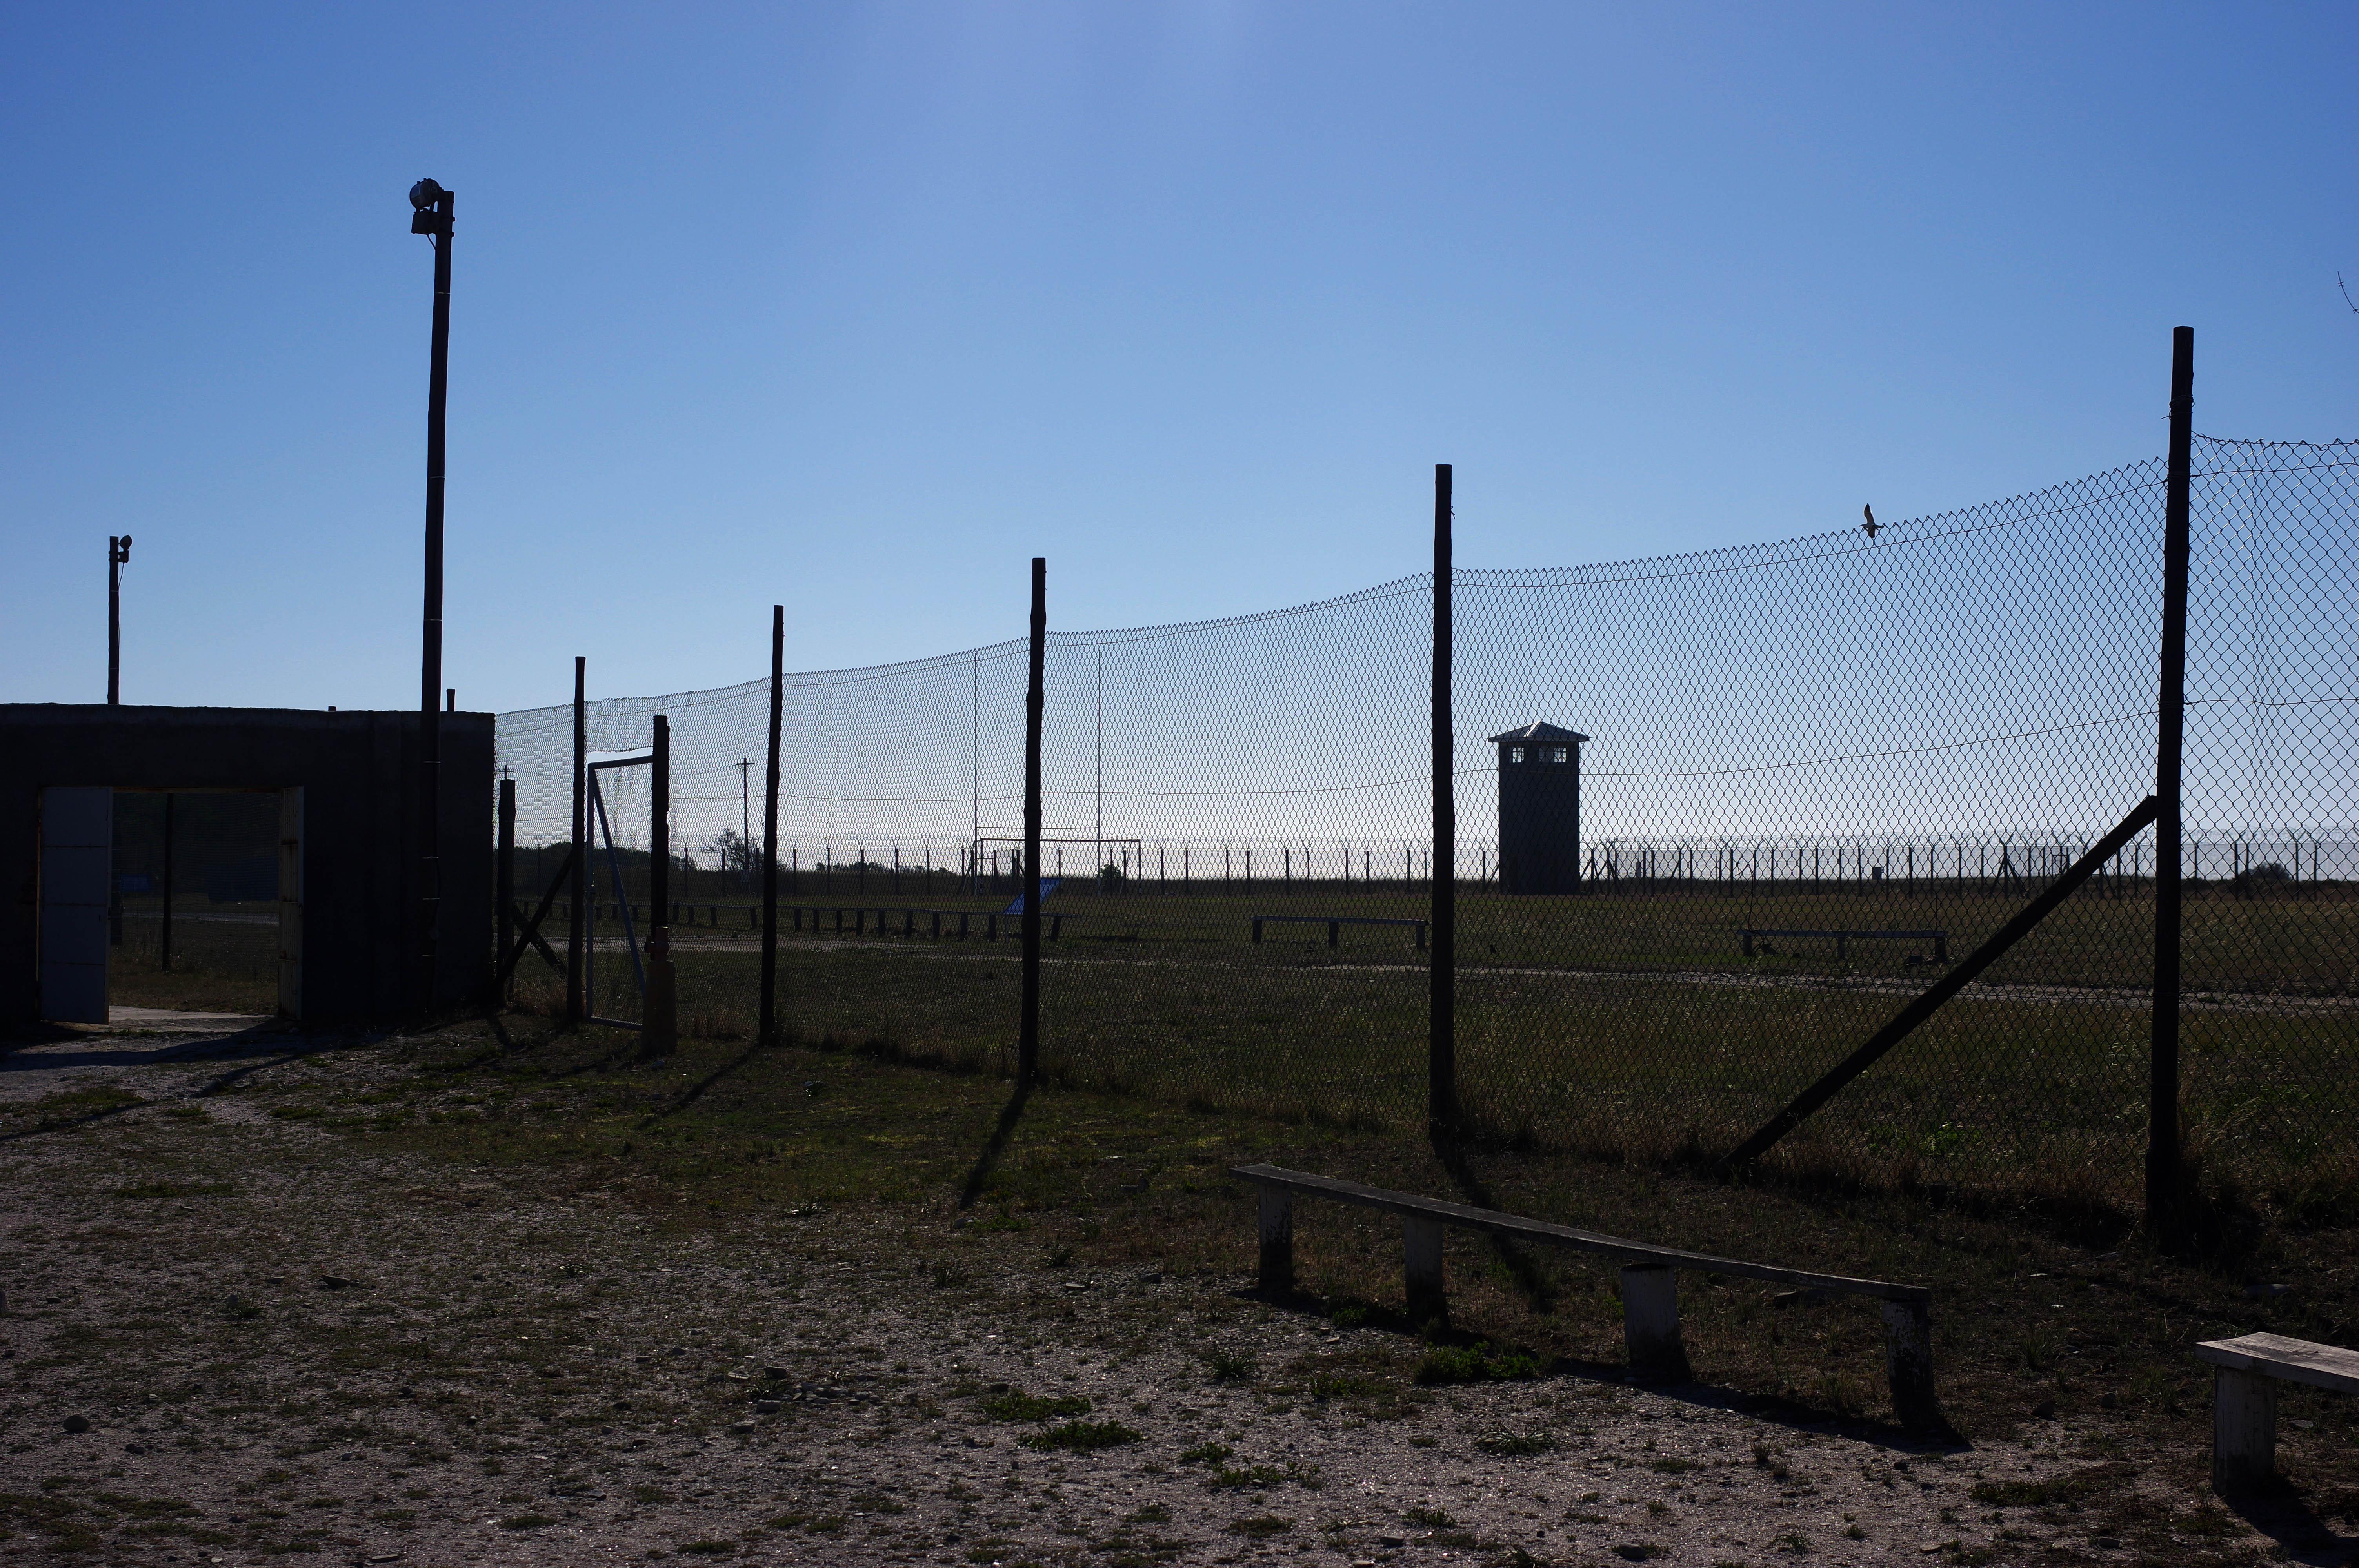 171122_CT_Robben island12